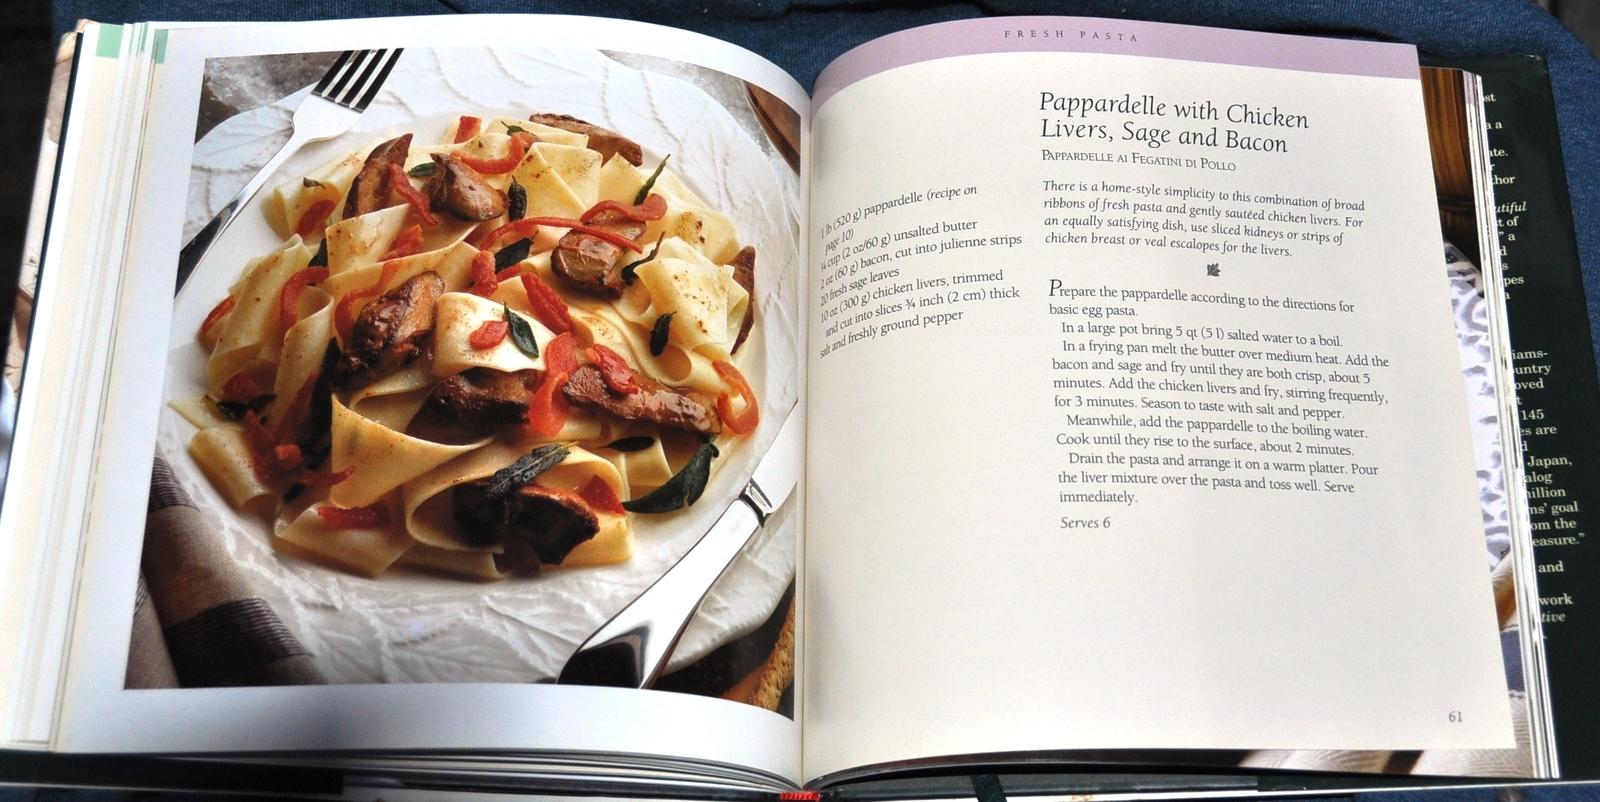 Pasta Recipe Cookbook from the Williams-Sonoma Kitchen Library